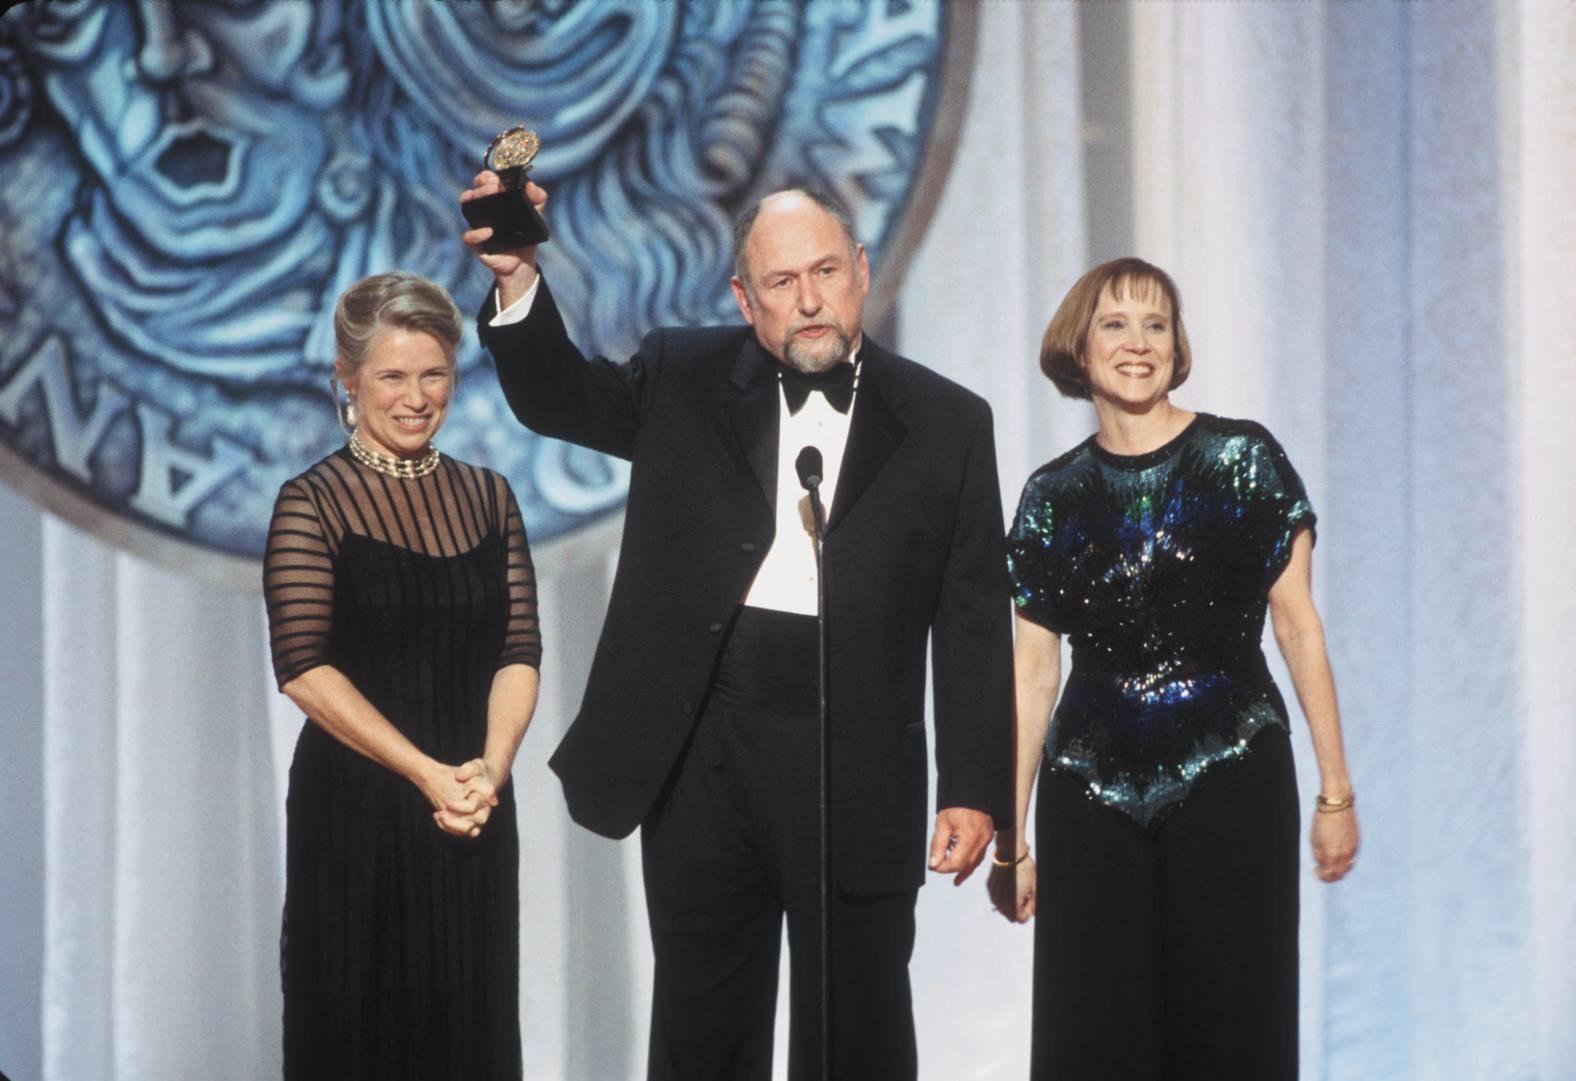 Marcelle McVay, Dennis Zacek and Sandy Shinner celebrate 2001 regional theater Tony Award for Victory Gardens.